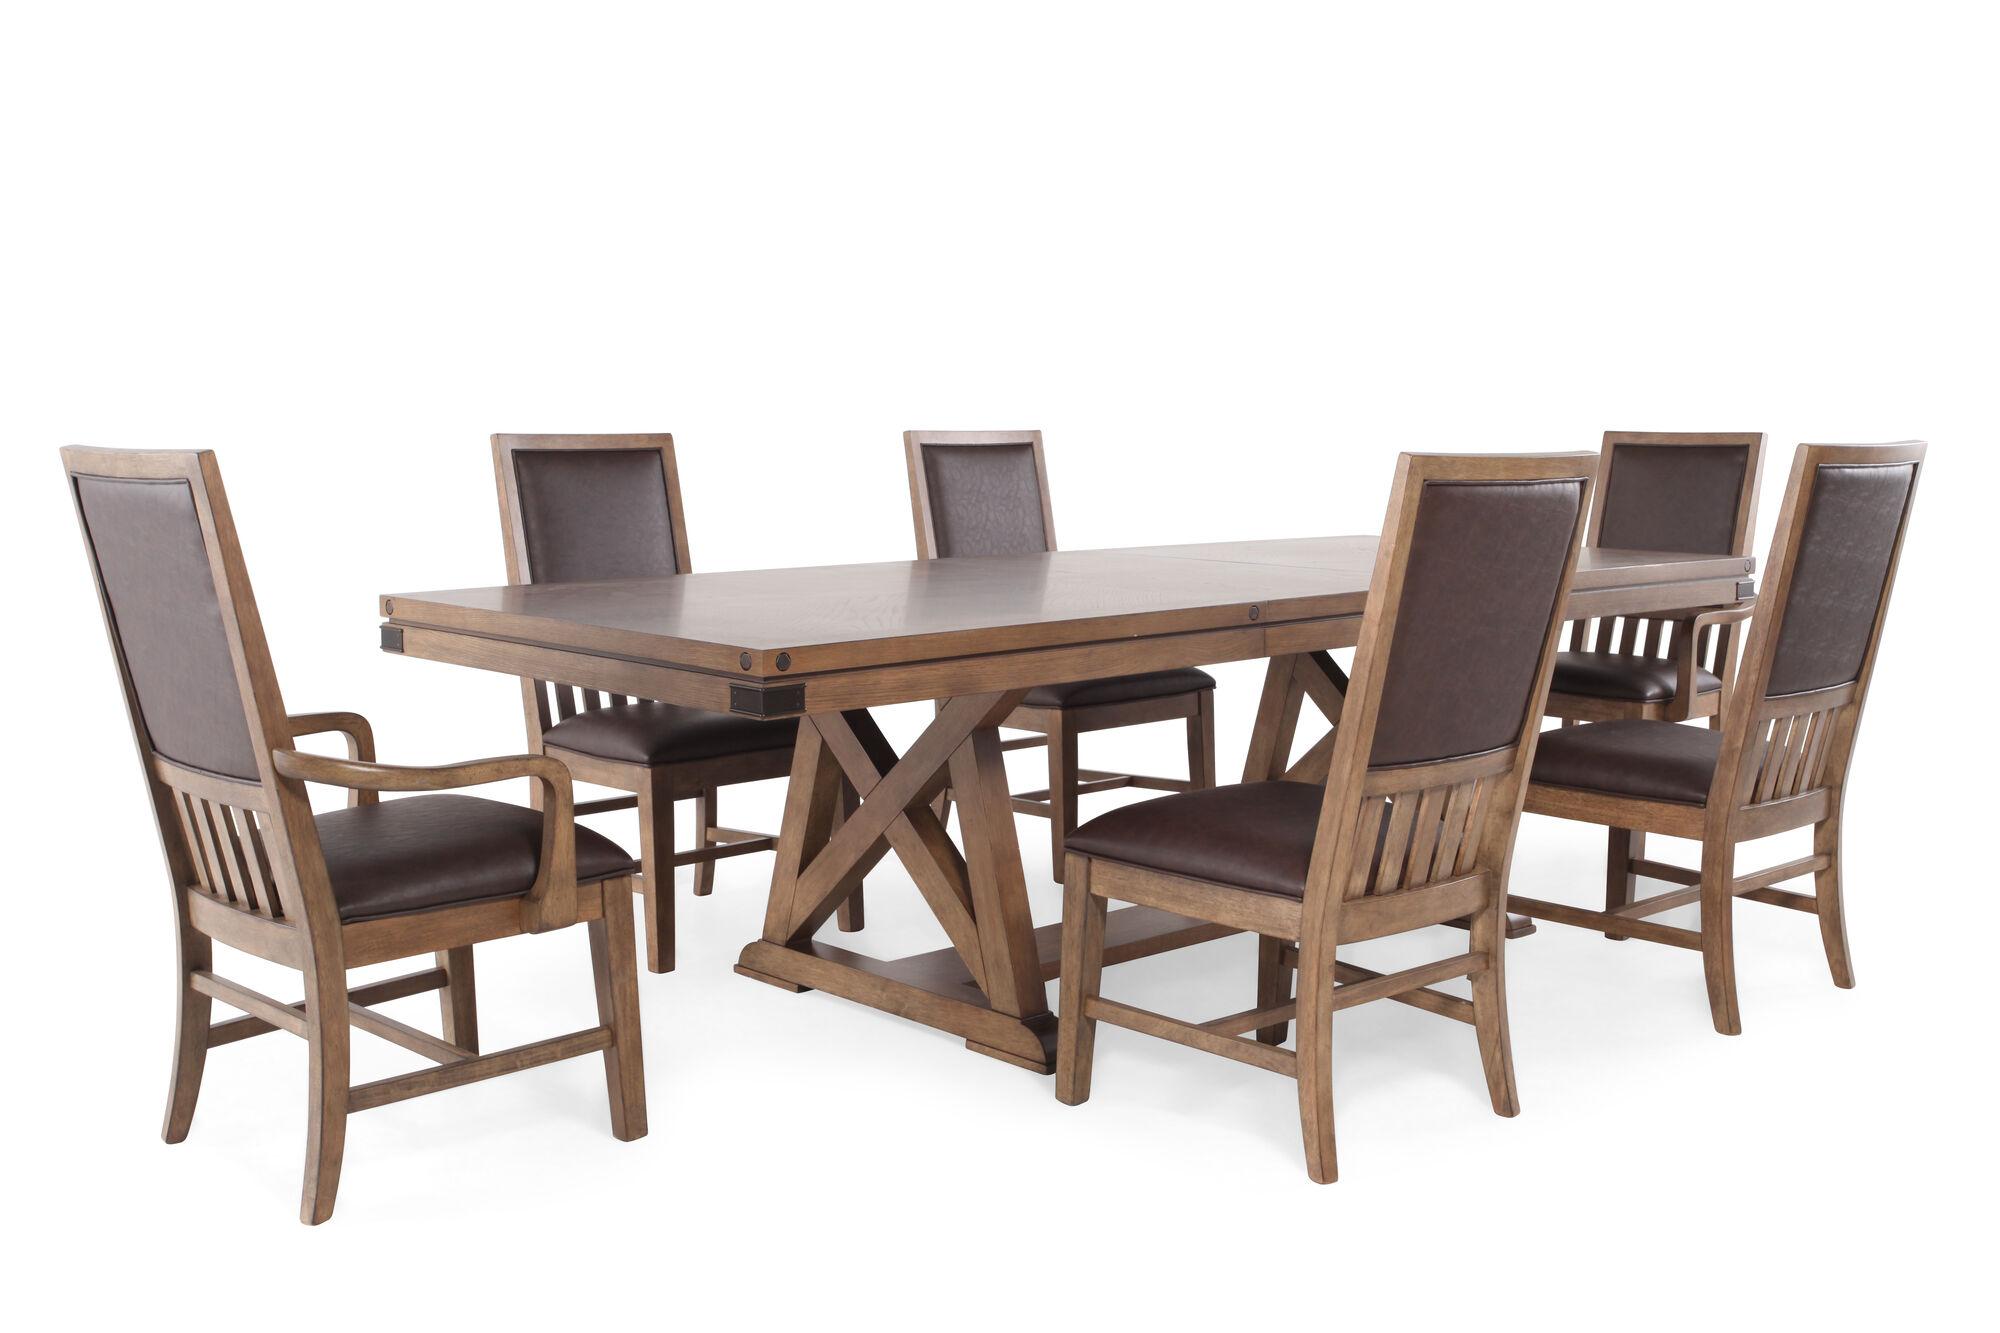 seven piece transitional 108 39 39 dining set in medium brown mathis brothers furniture. Black Bedroom Furniture Sets. Home Design Ideas